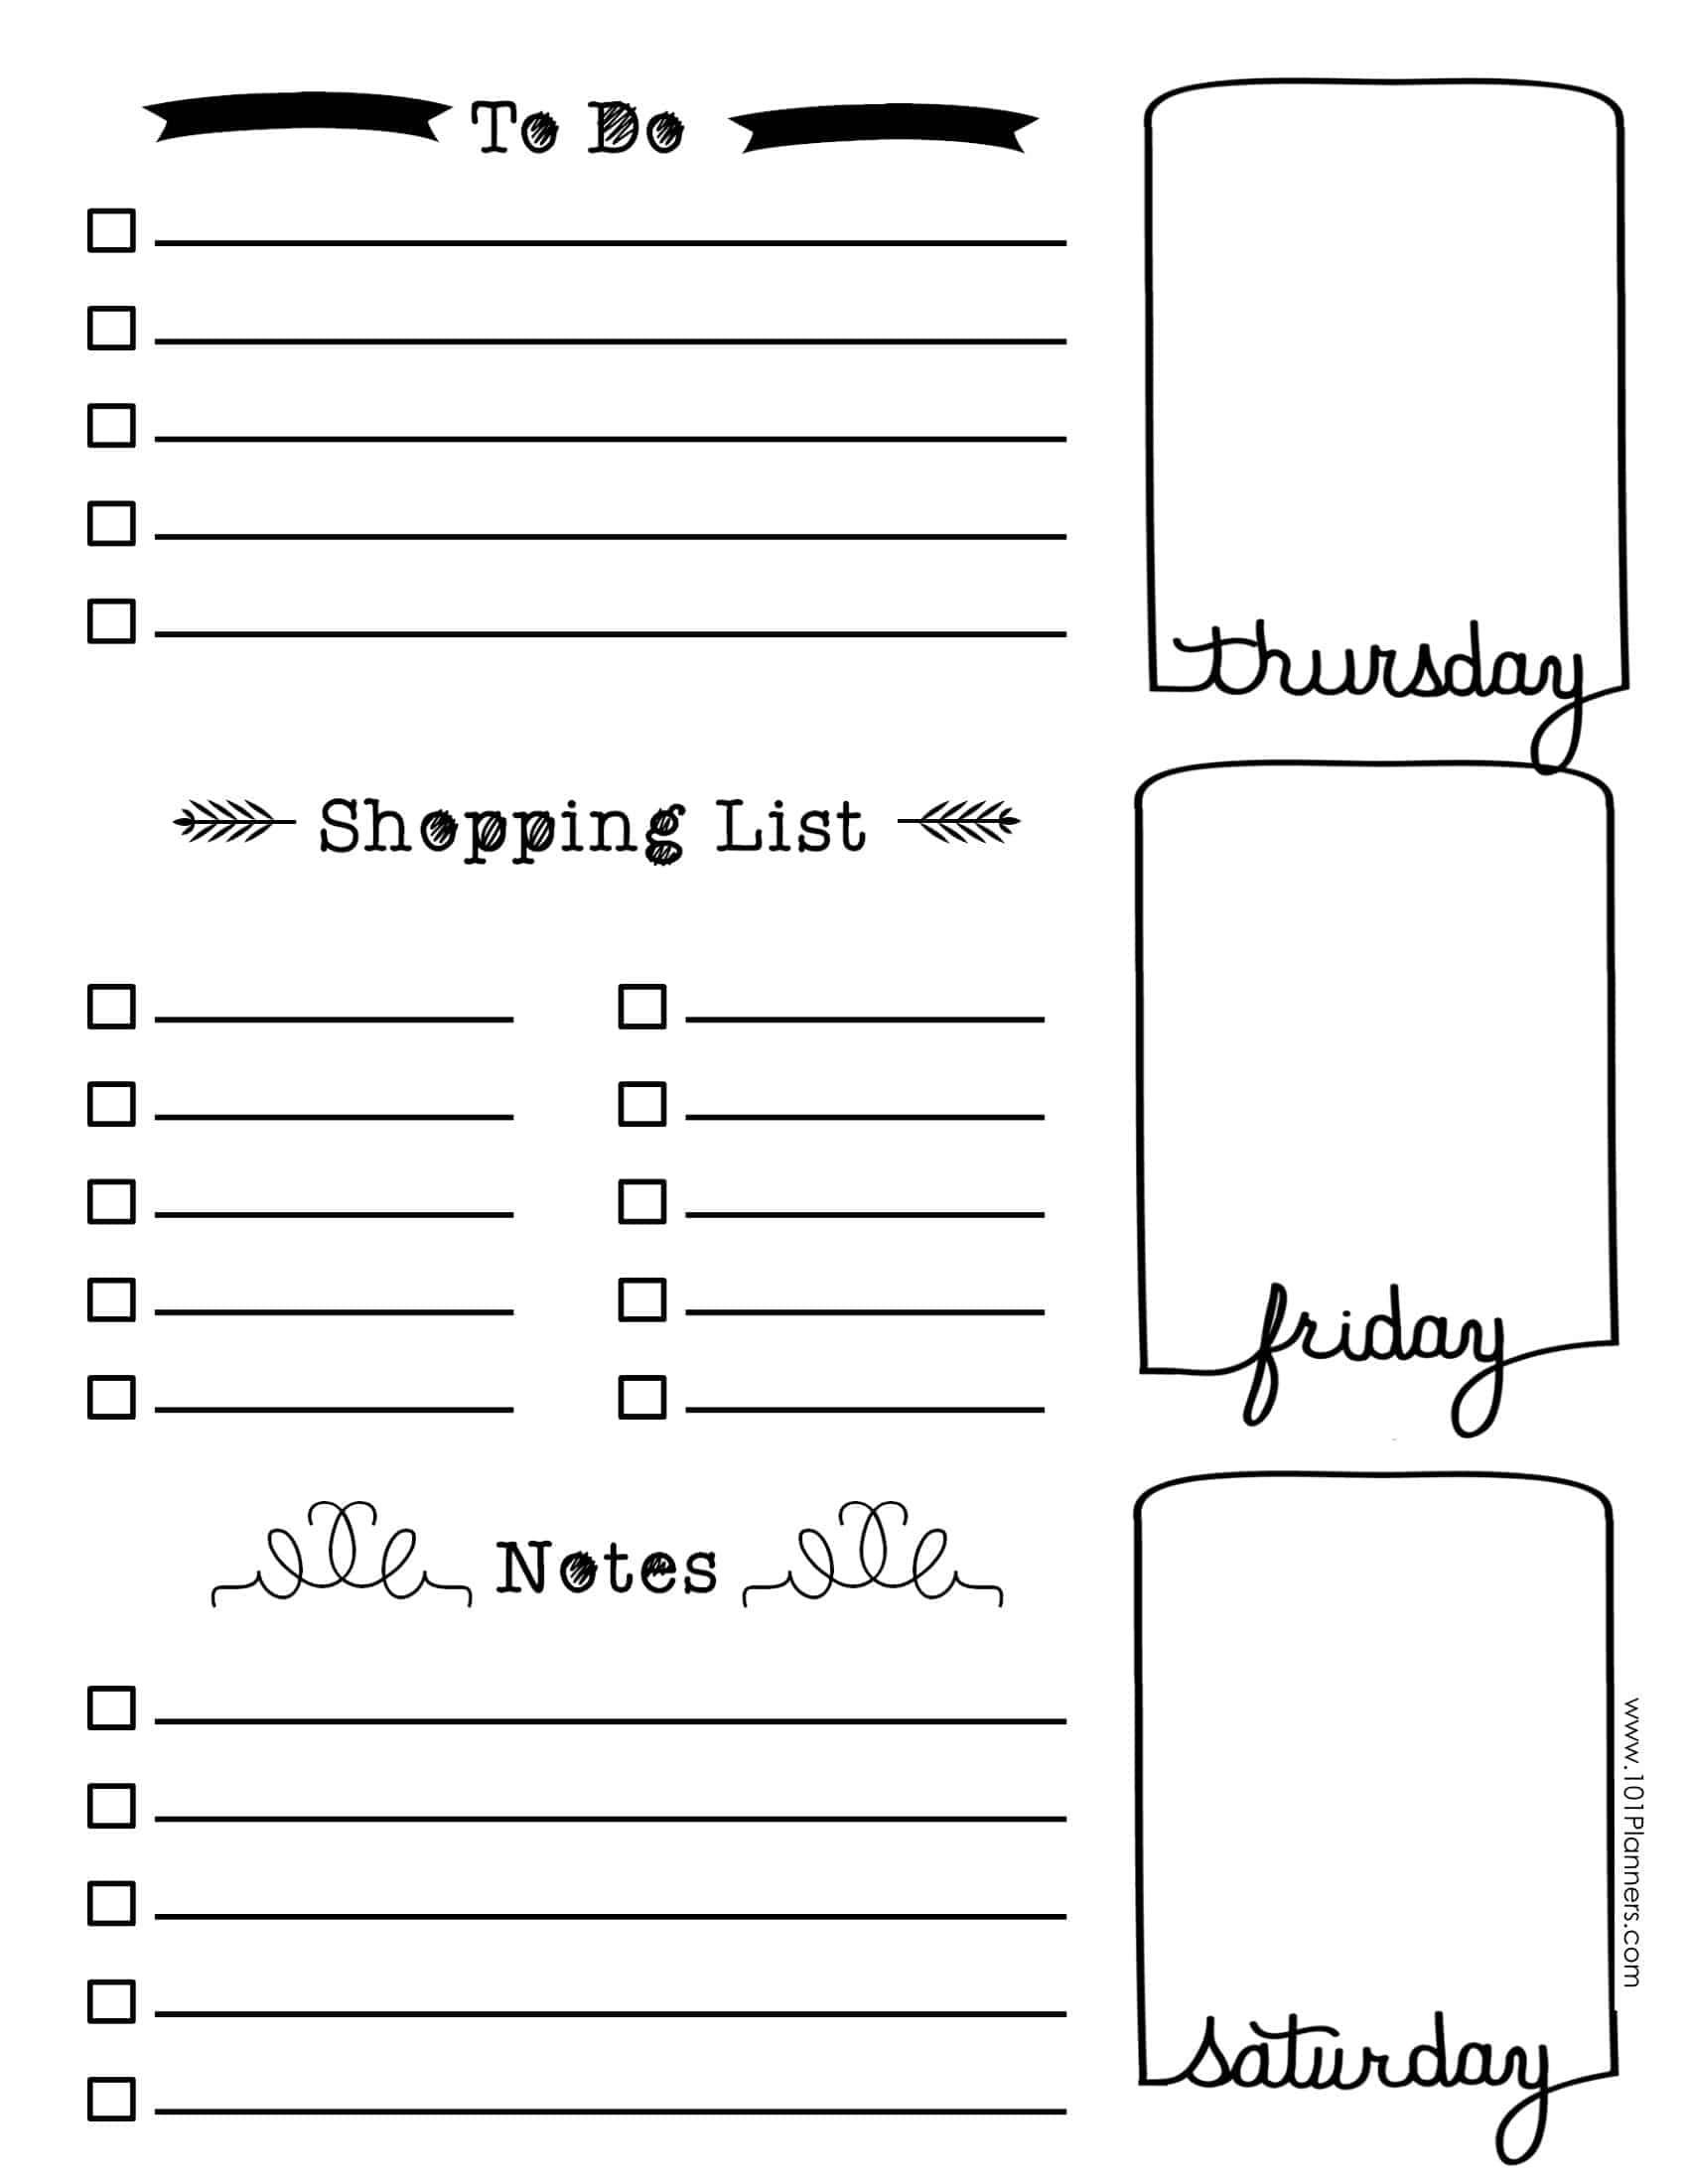 Free Bullet Journal Printables | Customize Online For Any Planner Size - Bullet Journal Printables Free